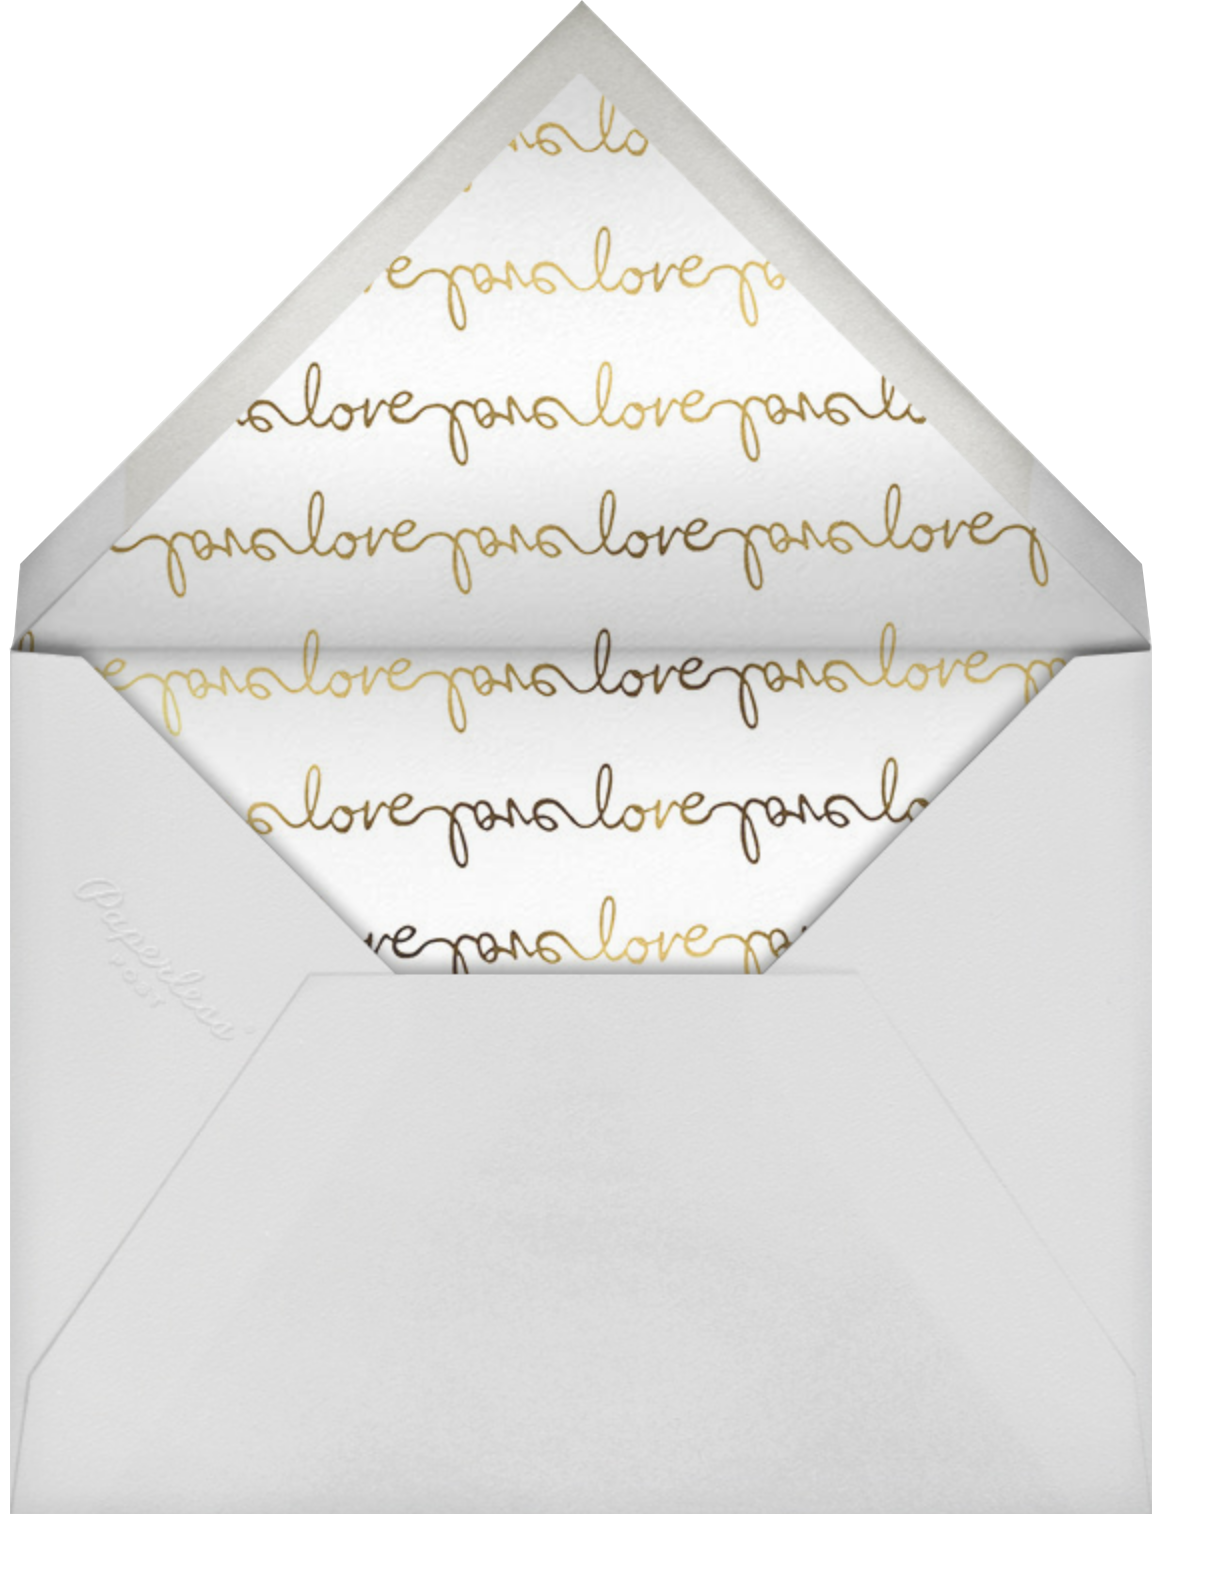 Third's a Charm - Blue - kate spade new york - Rehearsal dinner - envelope back